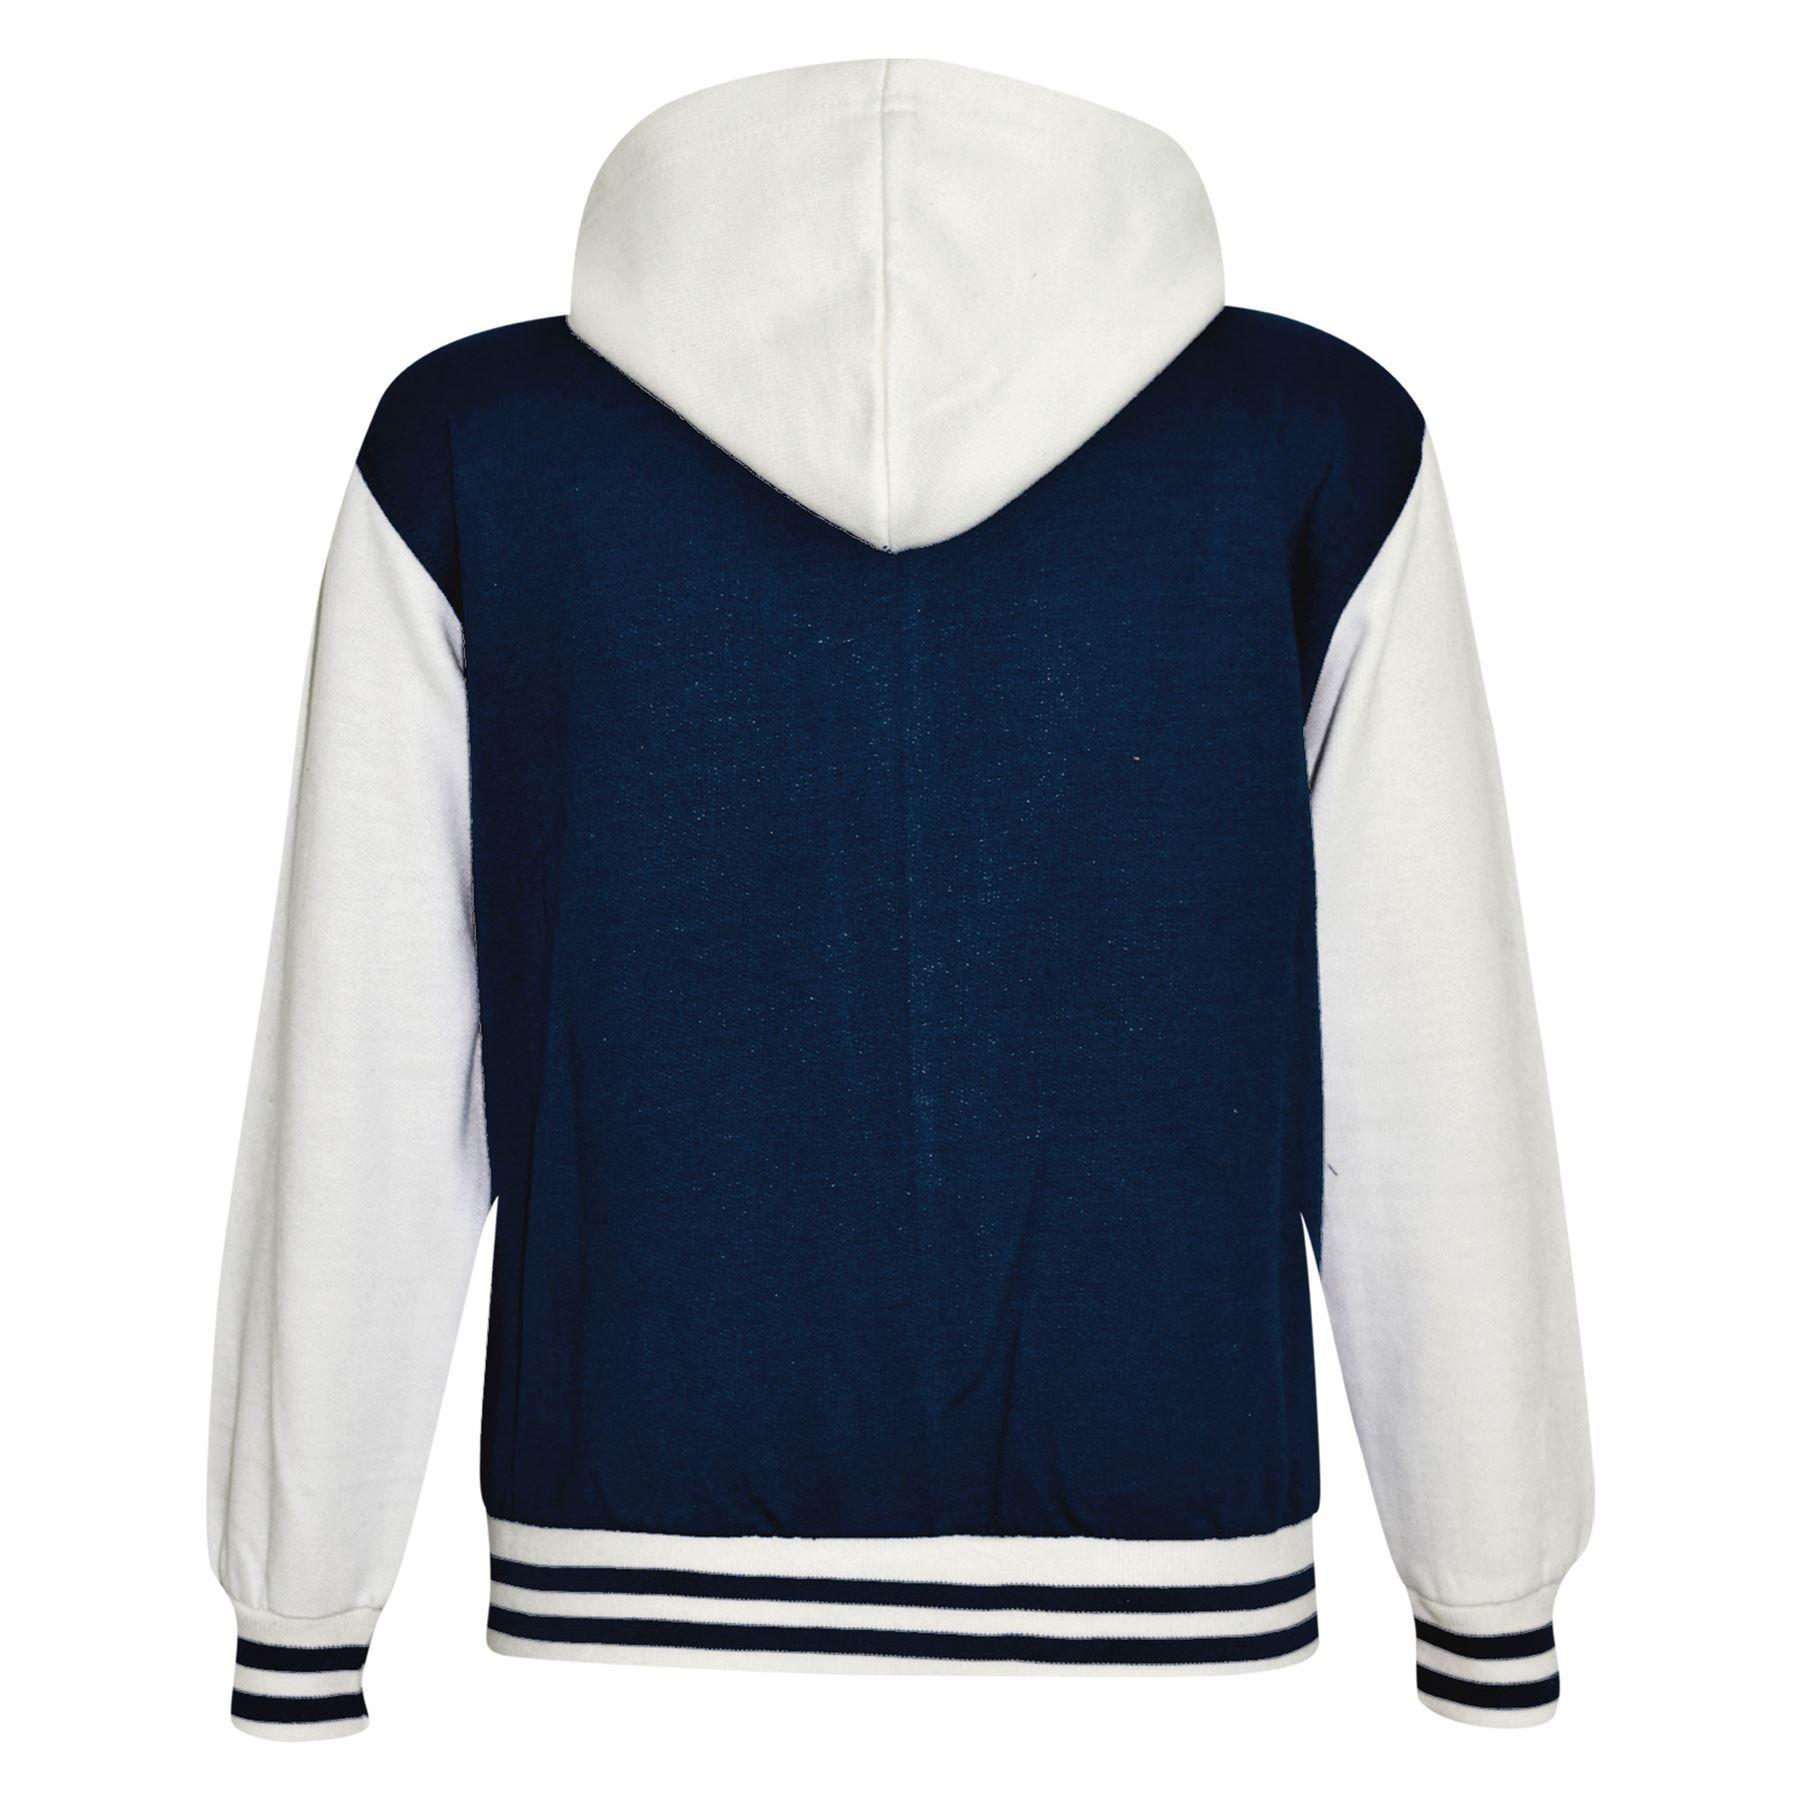 Kids Girls Boys Baseball Plain Hooded Jacket Stylish Varsity Hoodie